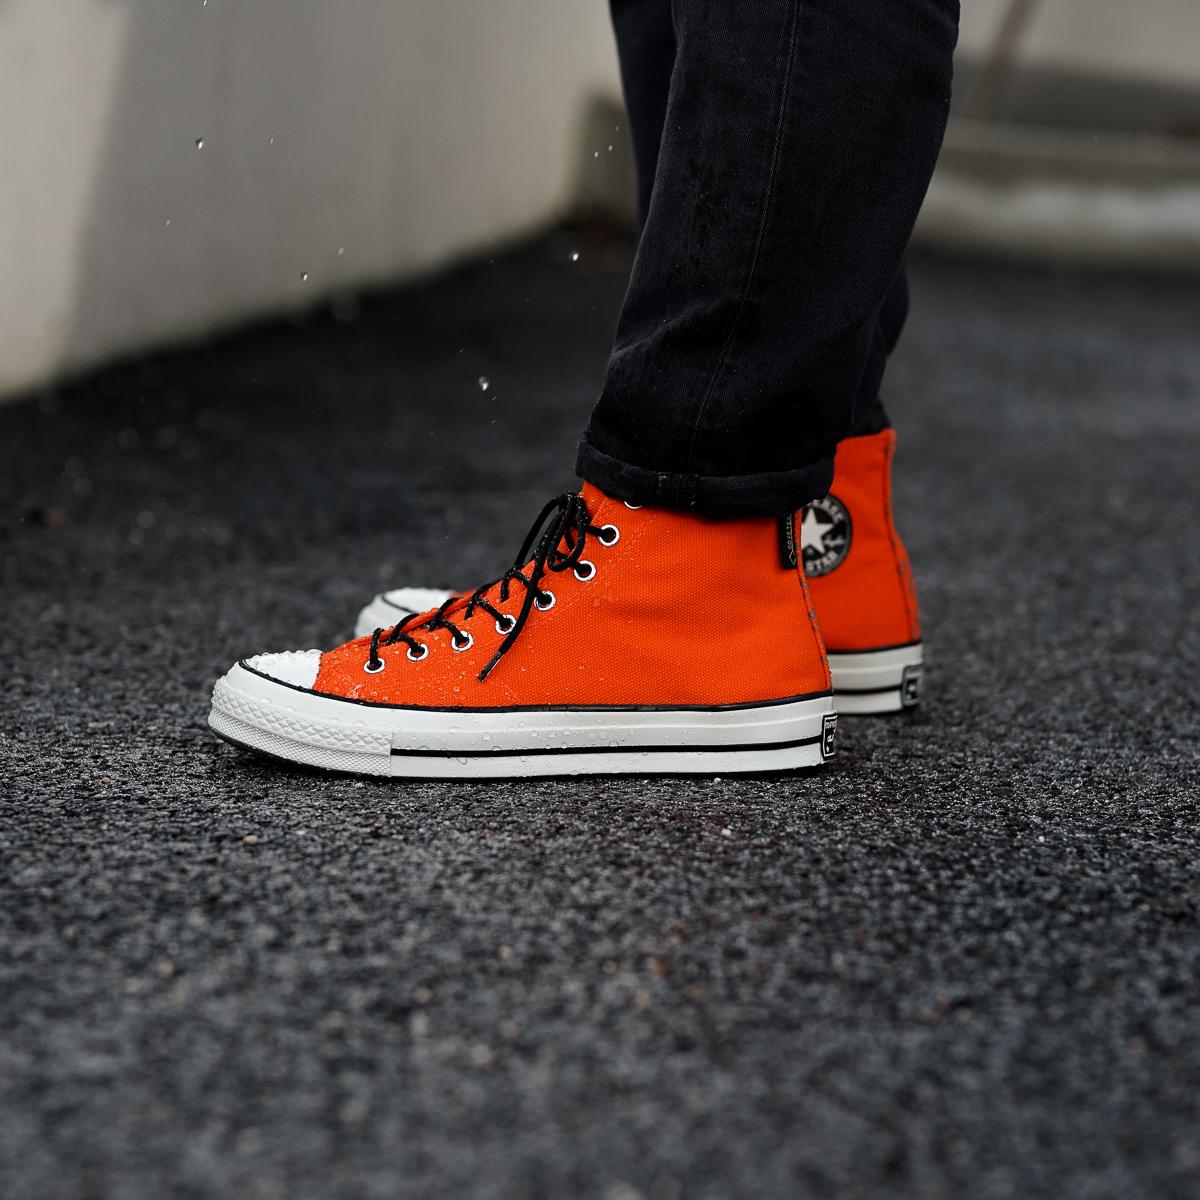 GORE TEX x Converse Chuck Taylor All Star 70 Orange